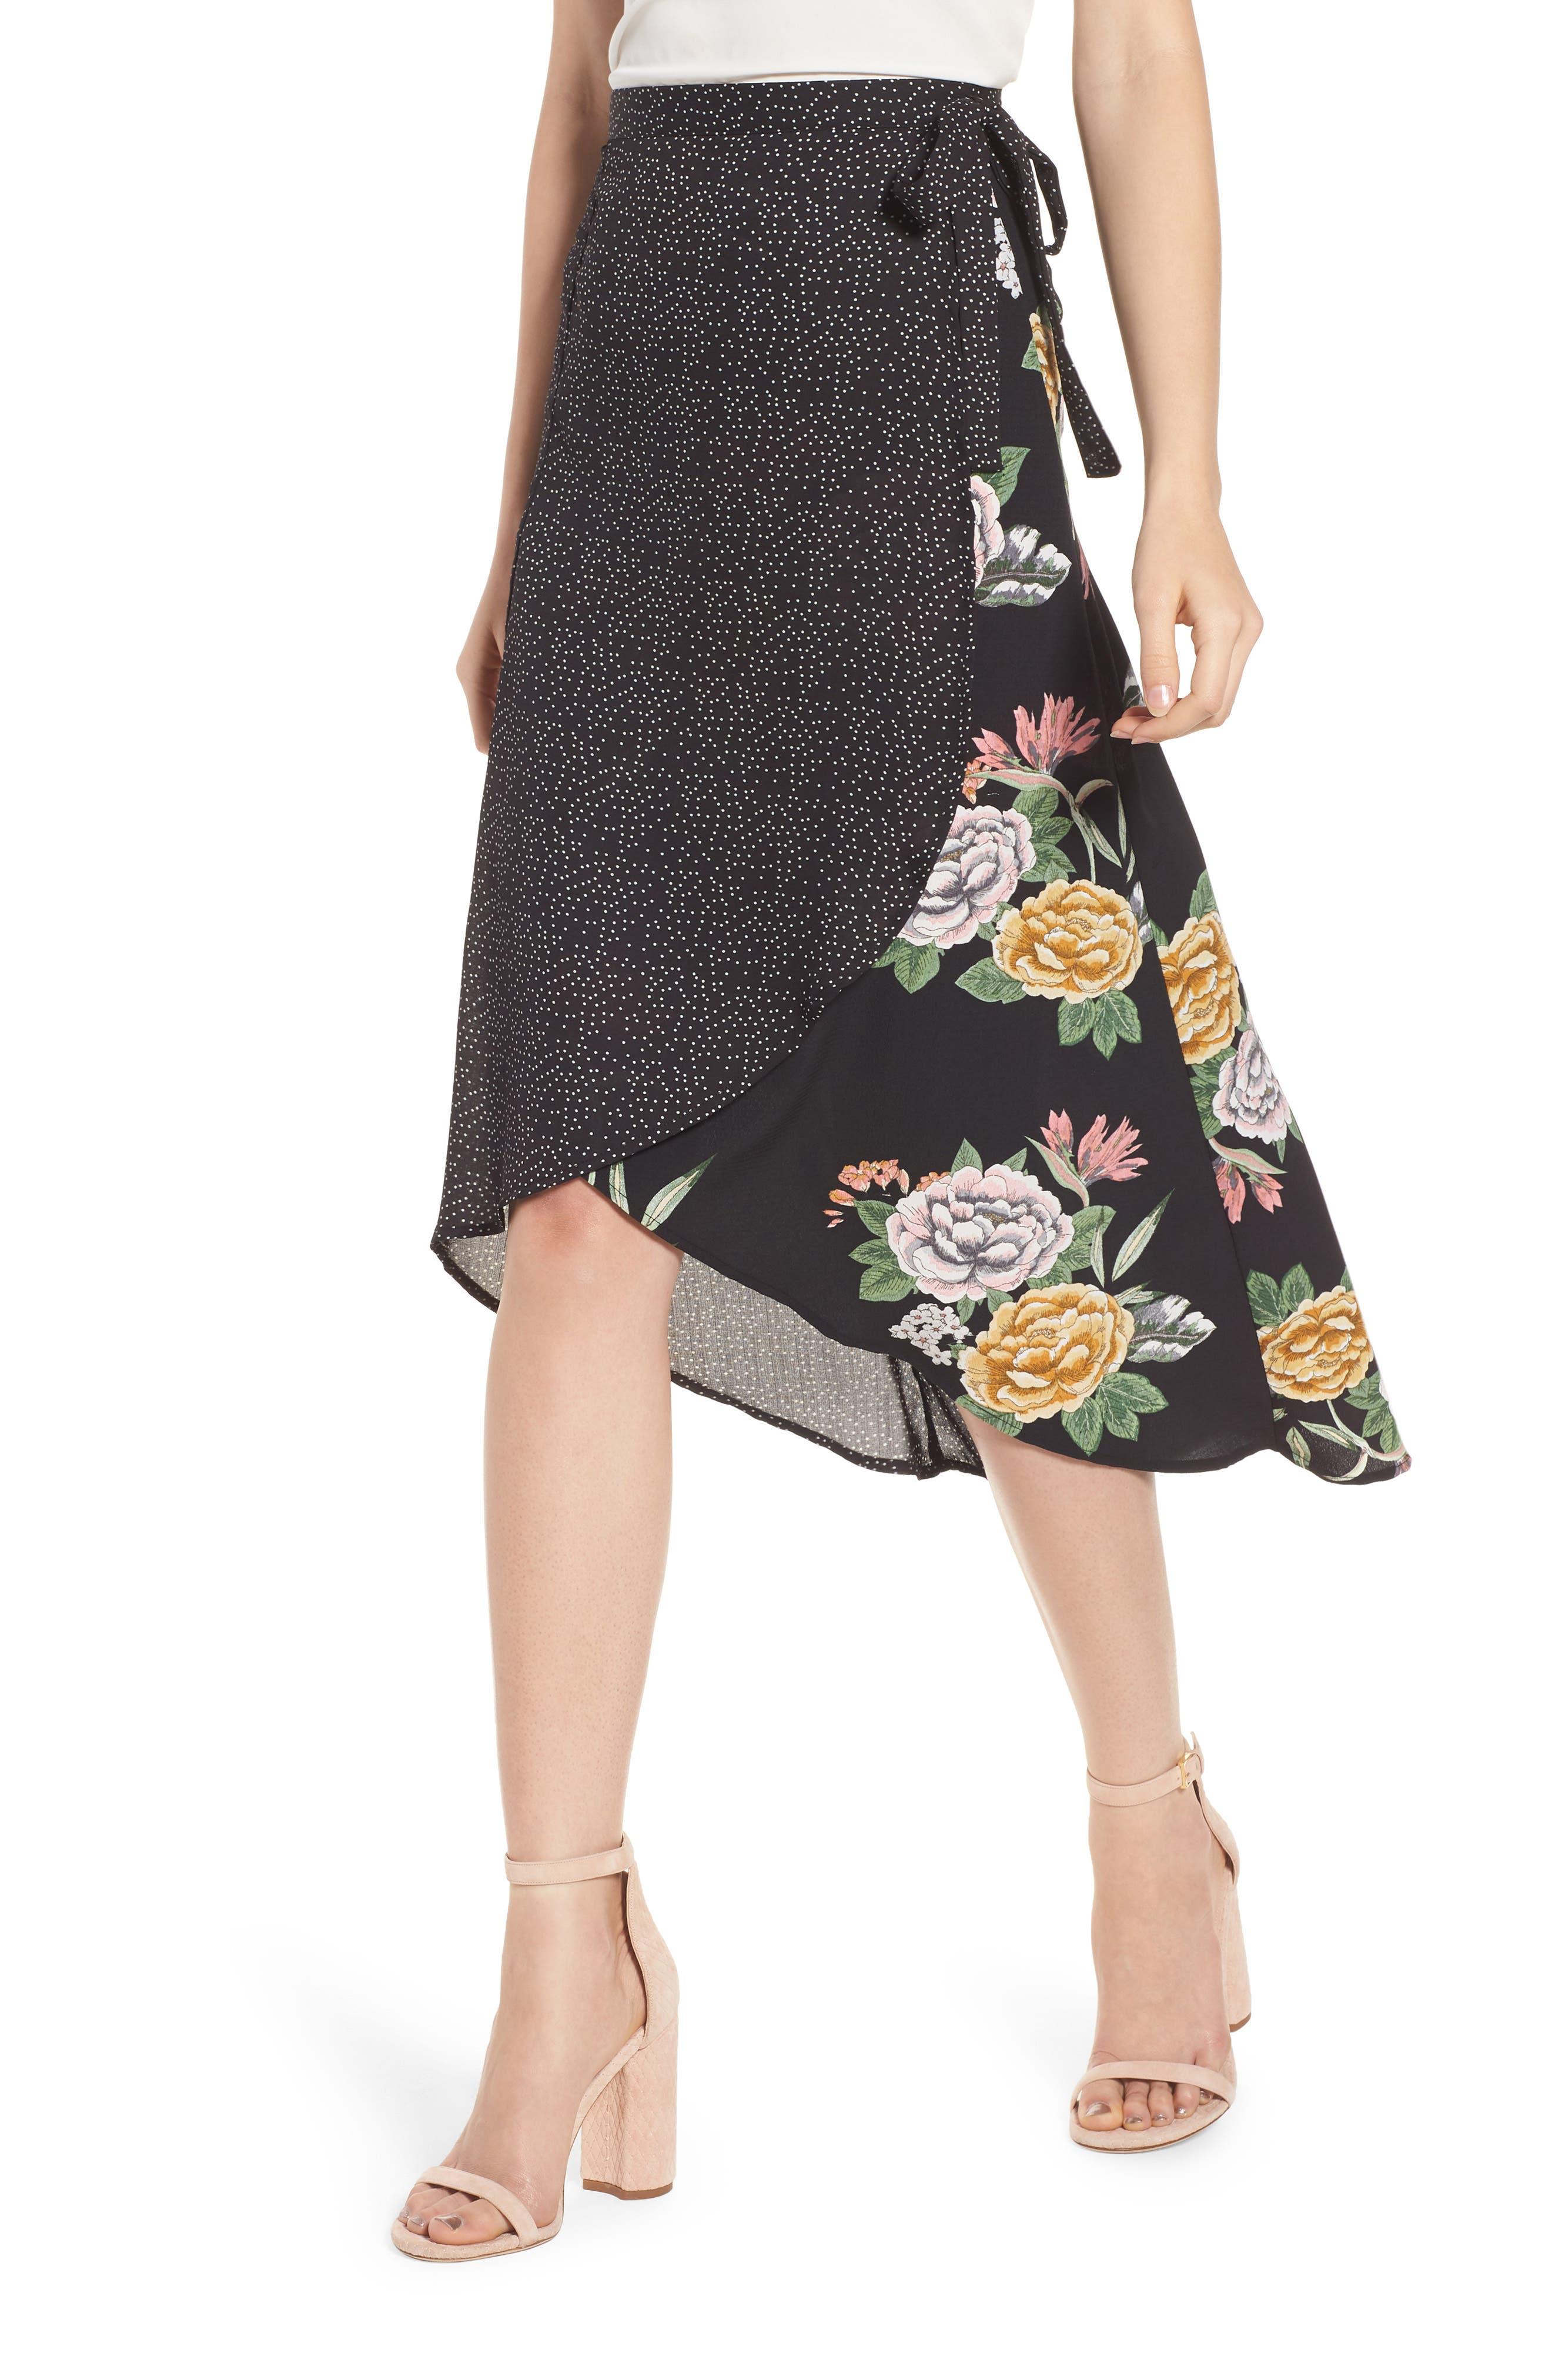 Bishop + Young Enchanted Garden Mix Media Skirt,                             Main thumbnail 1, color,                             Enchanted Garden Print